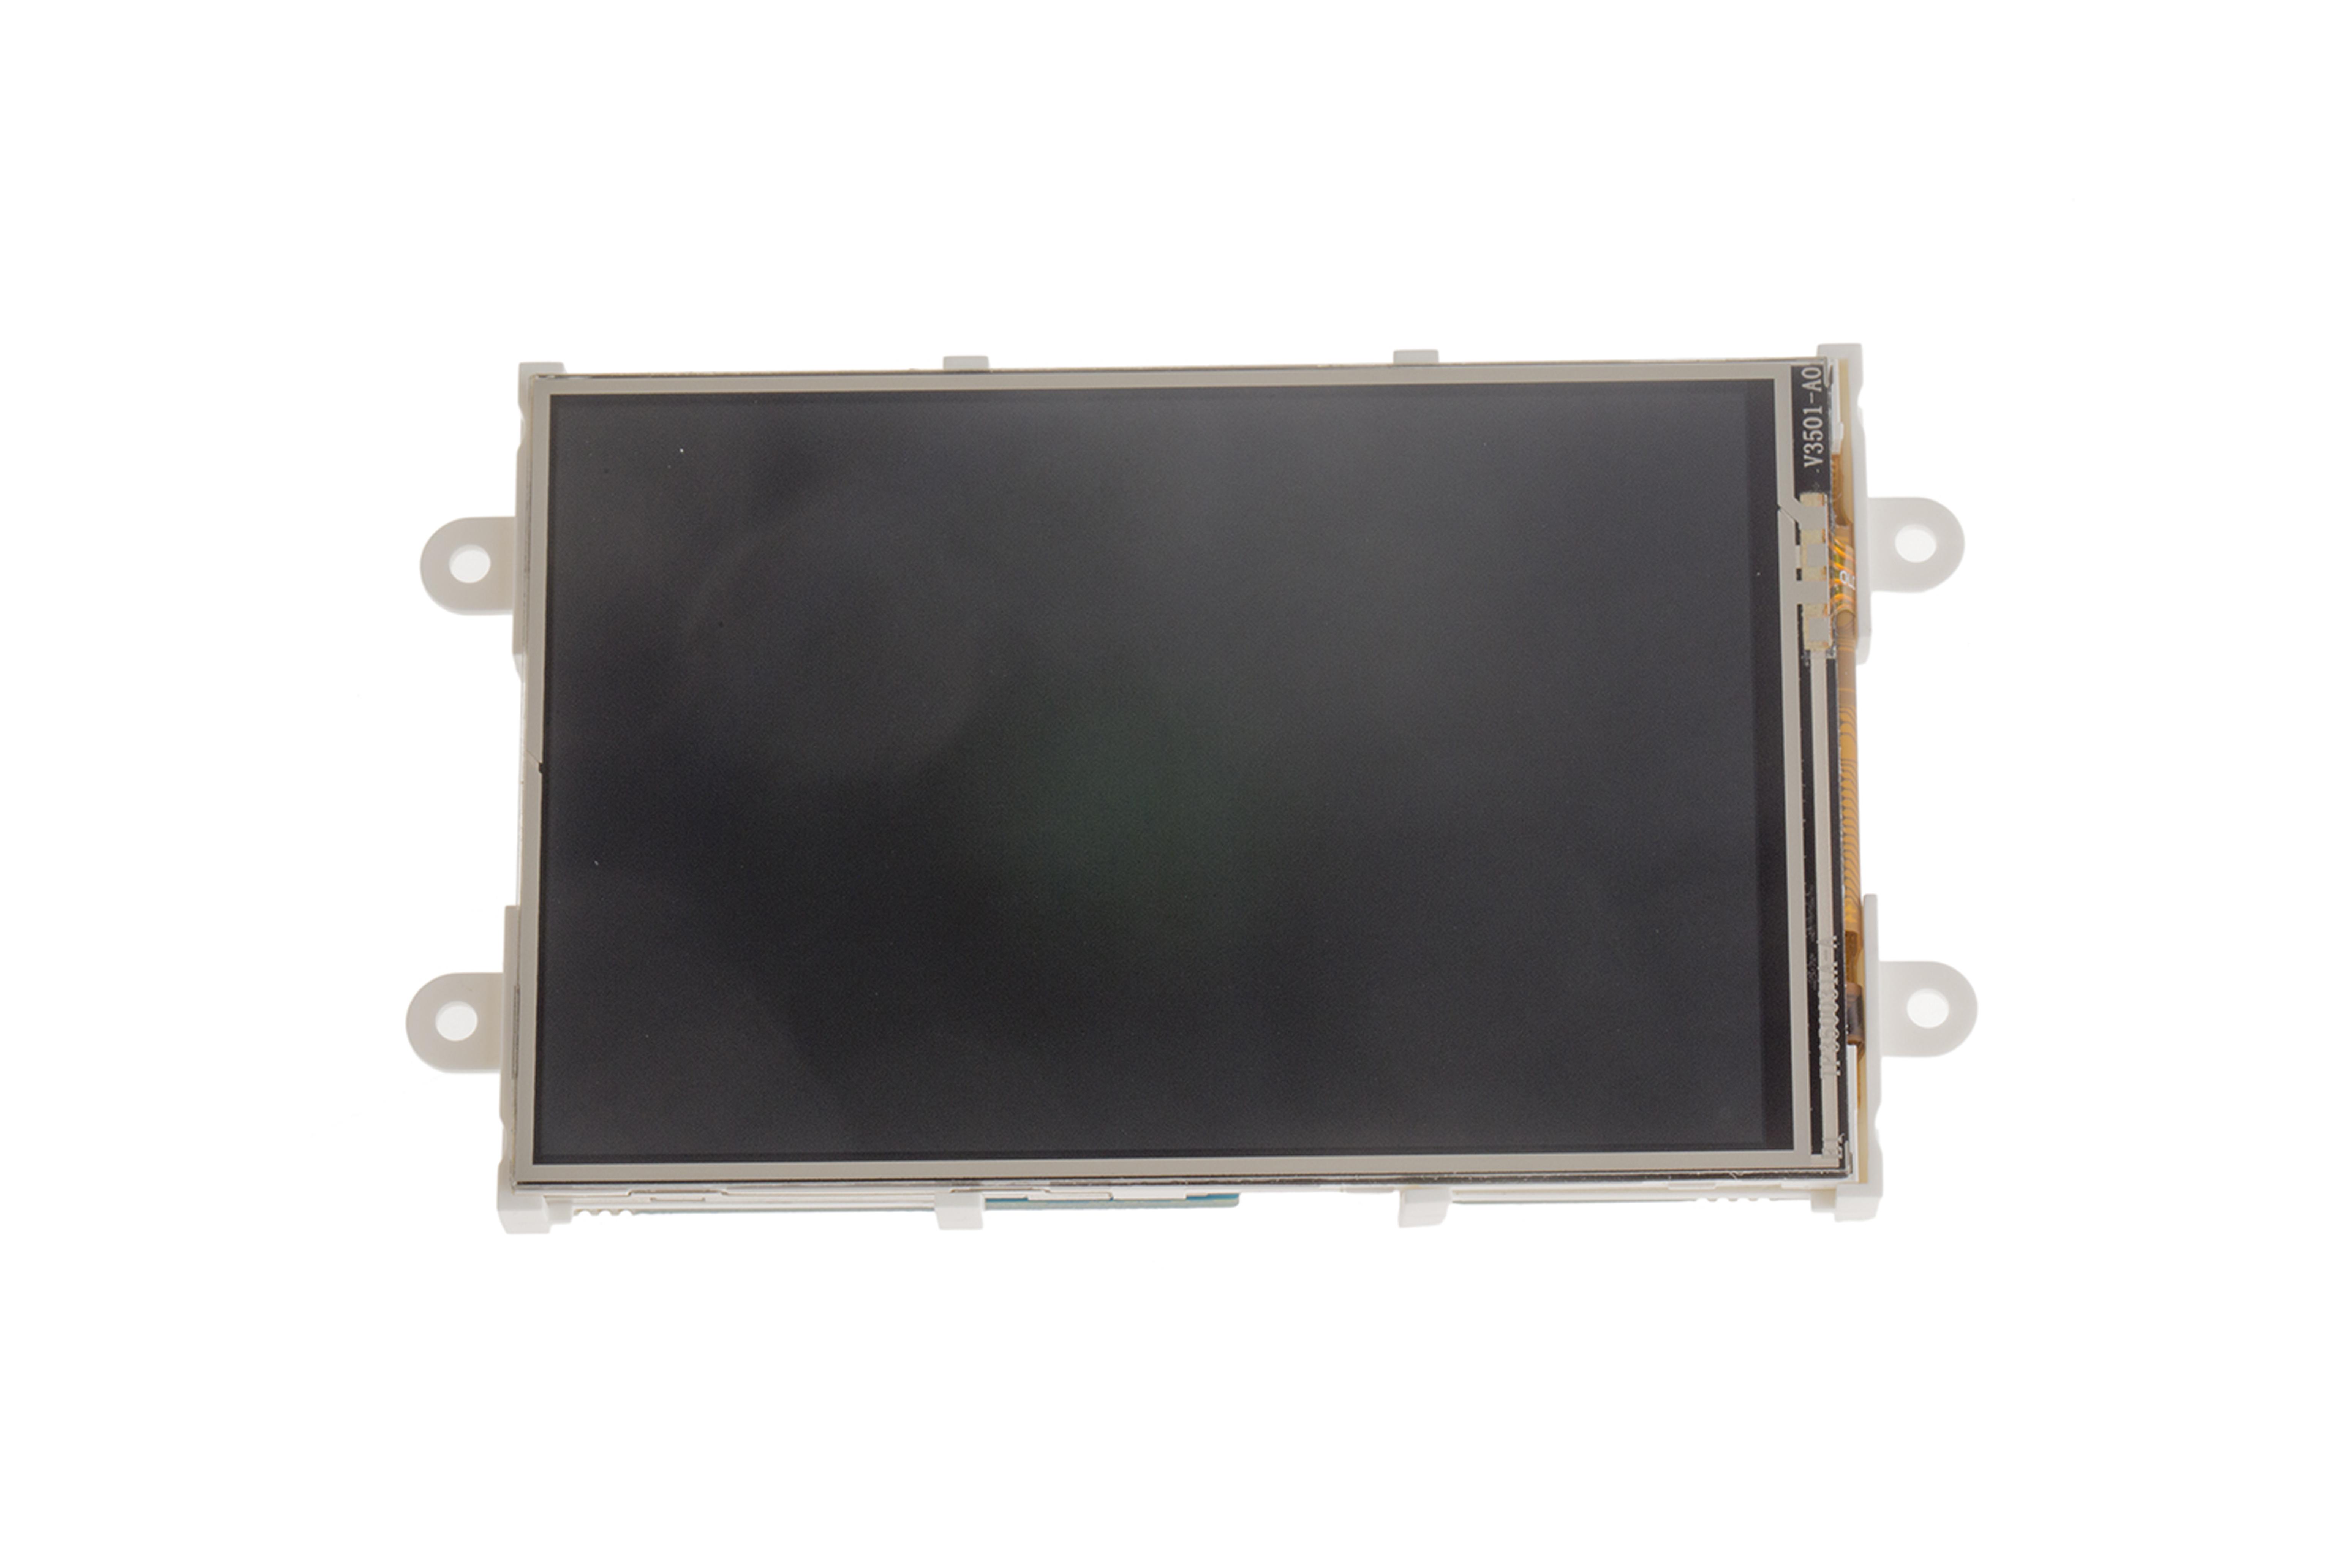 4Dpi-35 Mk2 Lcd Touchscreen Raspberry Pi